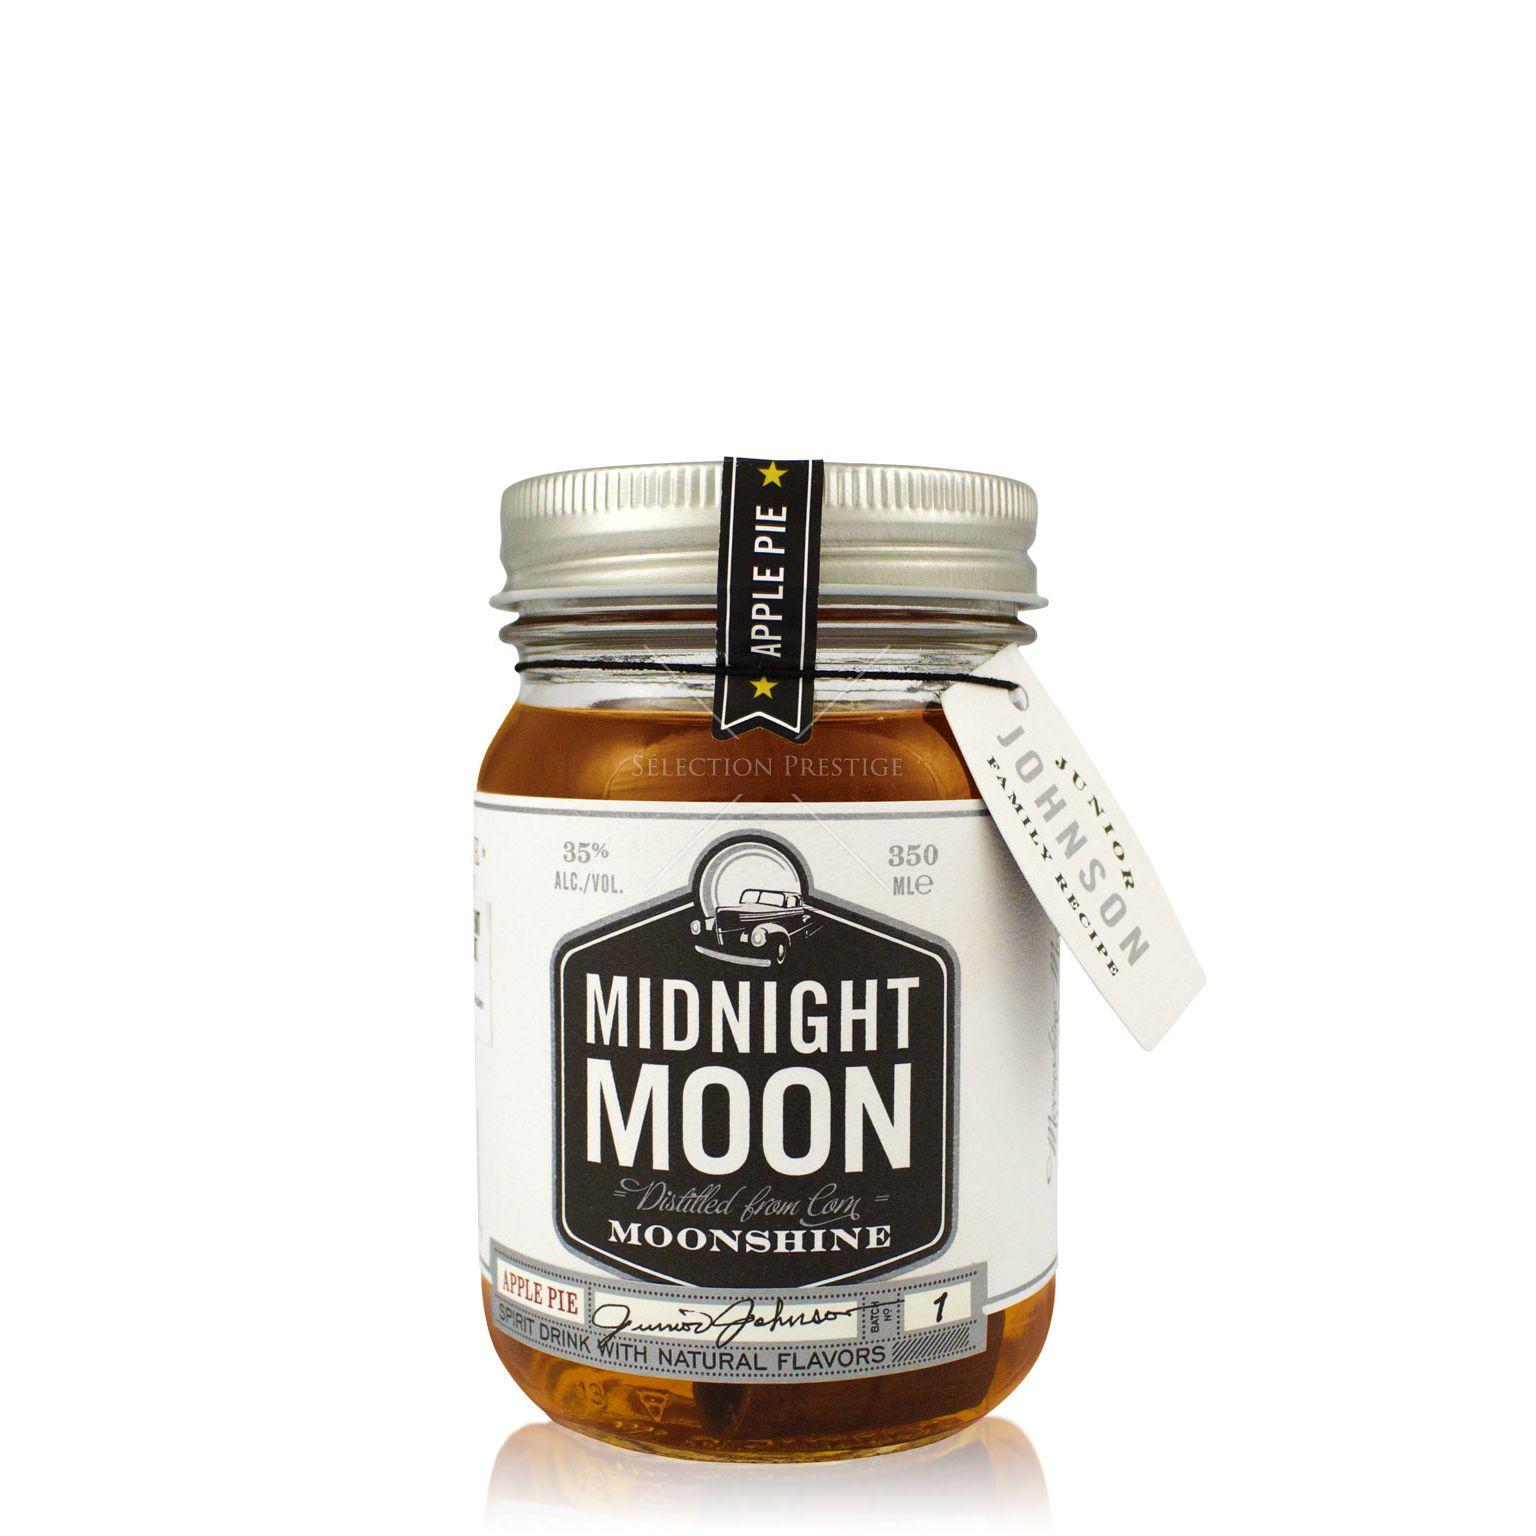 midnight moonshine drinks - photo #11